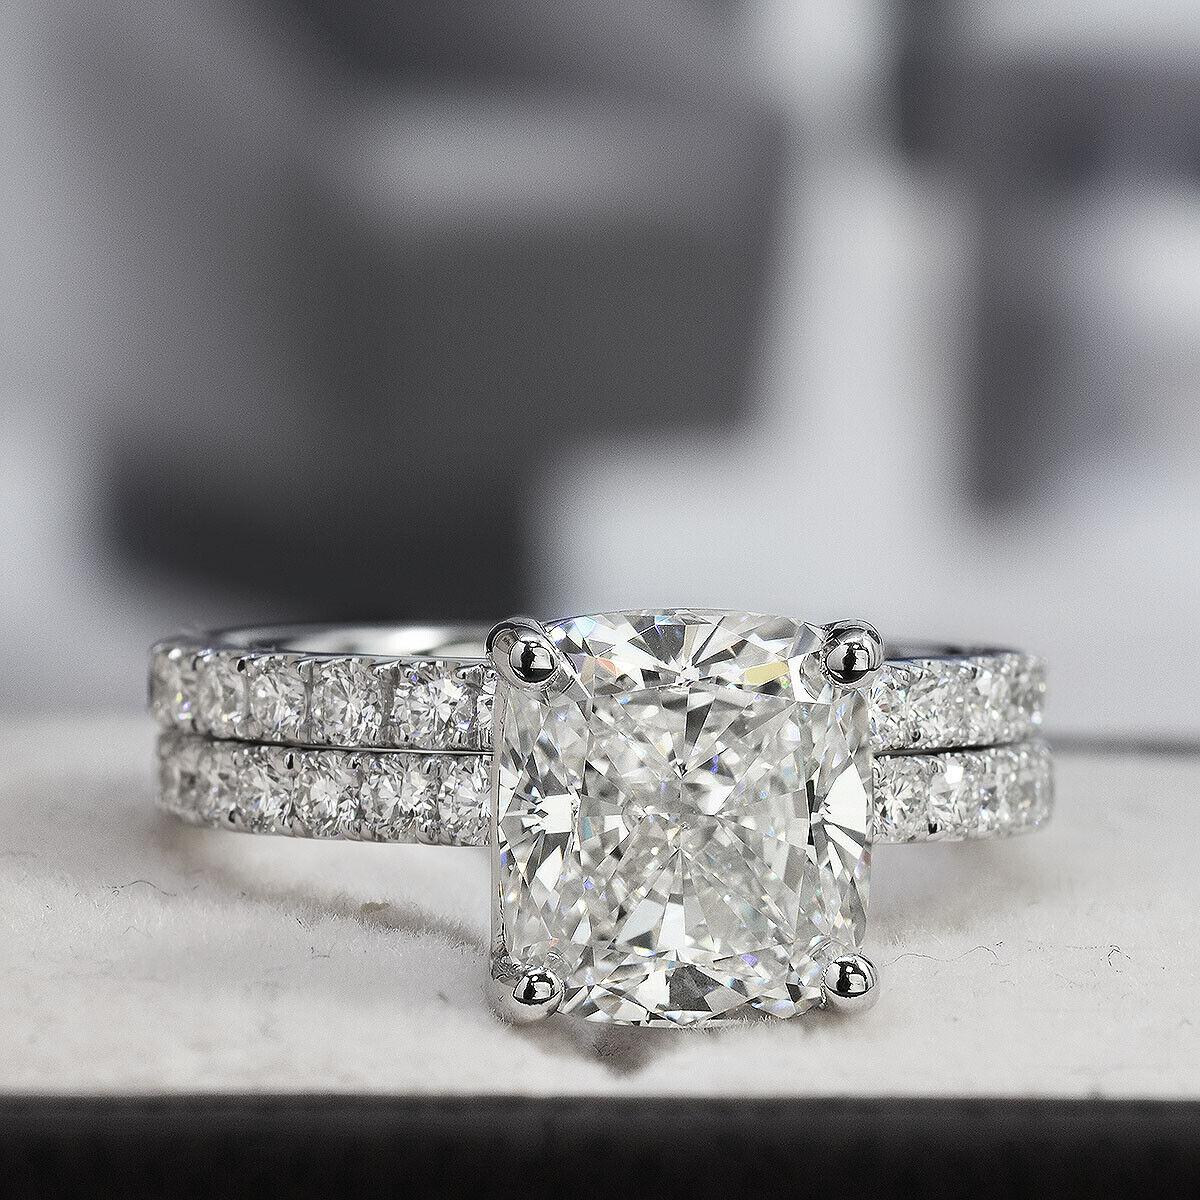 Dazzling 2.10 Ct. Cushion Cut Diamond Engagement Ring Bridal Set GIA Certified 3